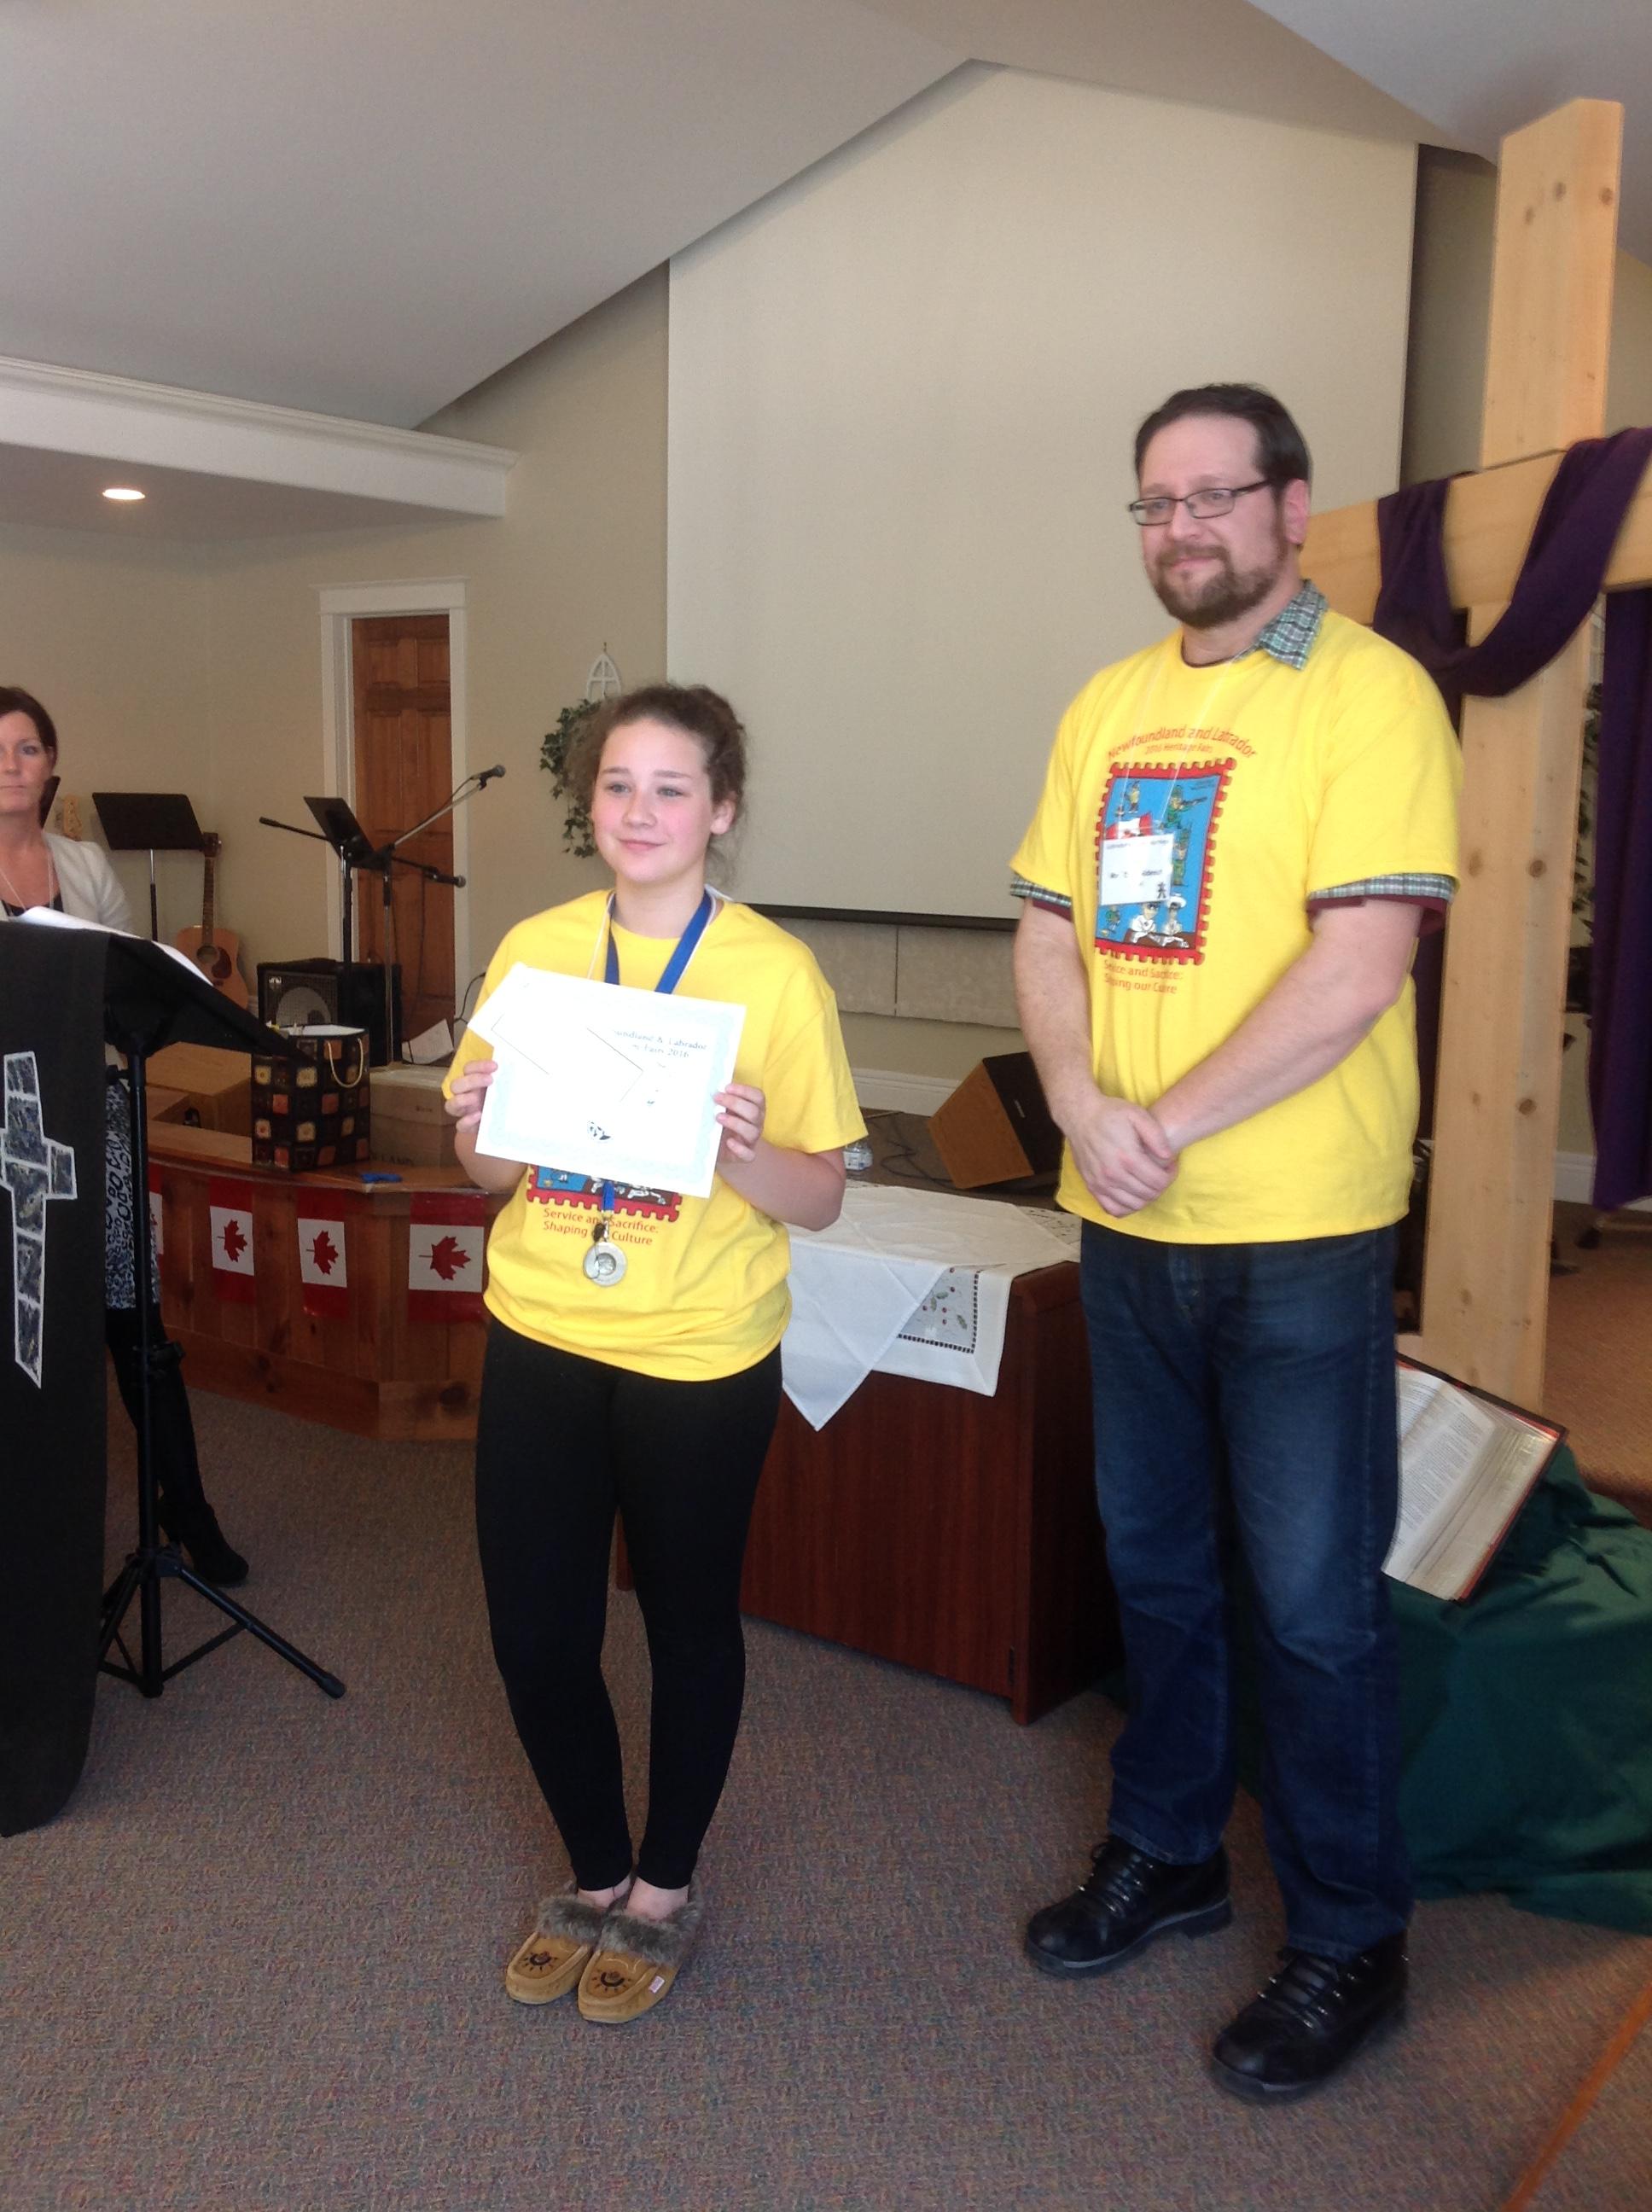 Heritage Foundation Award - Karley Sheppard